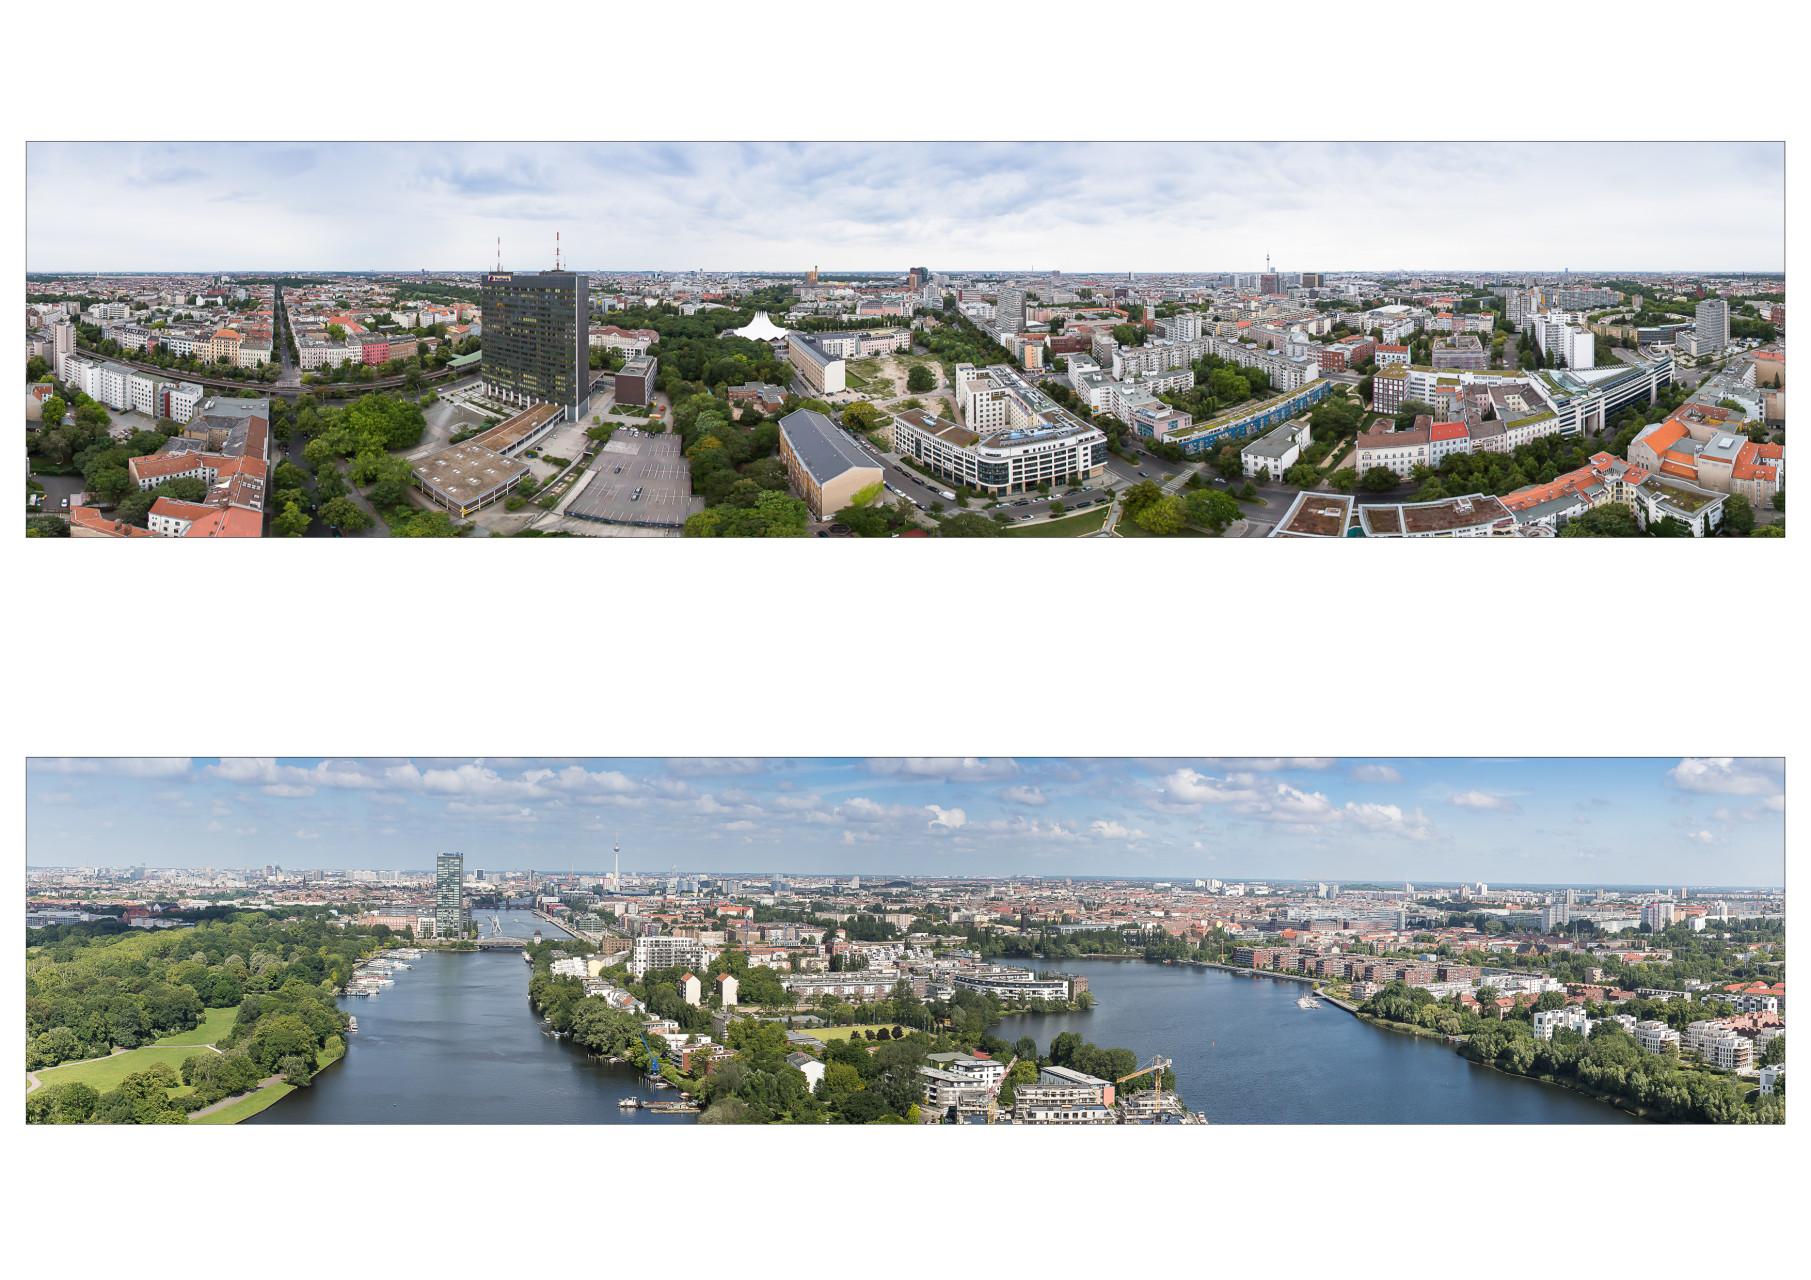 _©manuel-frauendorf-fotografie_luftbildfotograf_berlin_germany_phone_004917623178911_